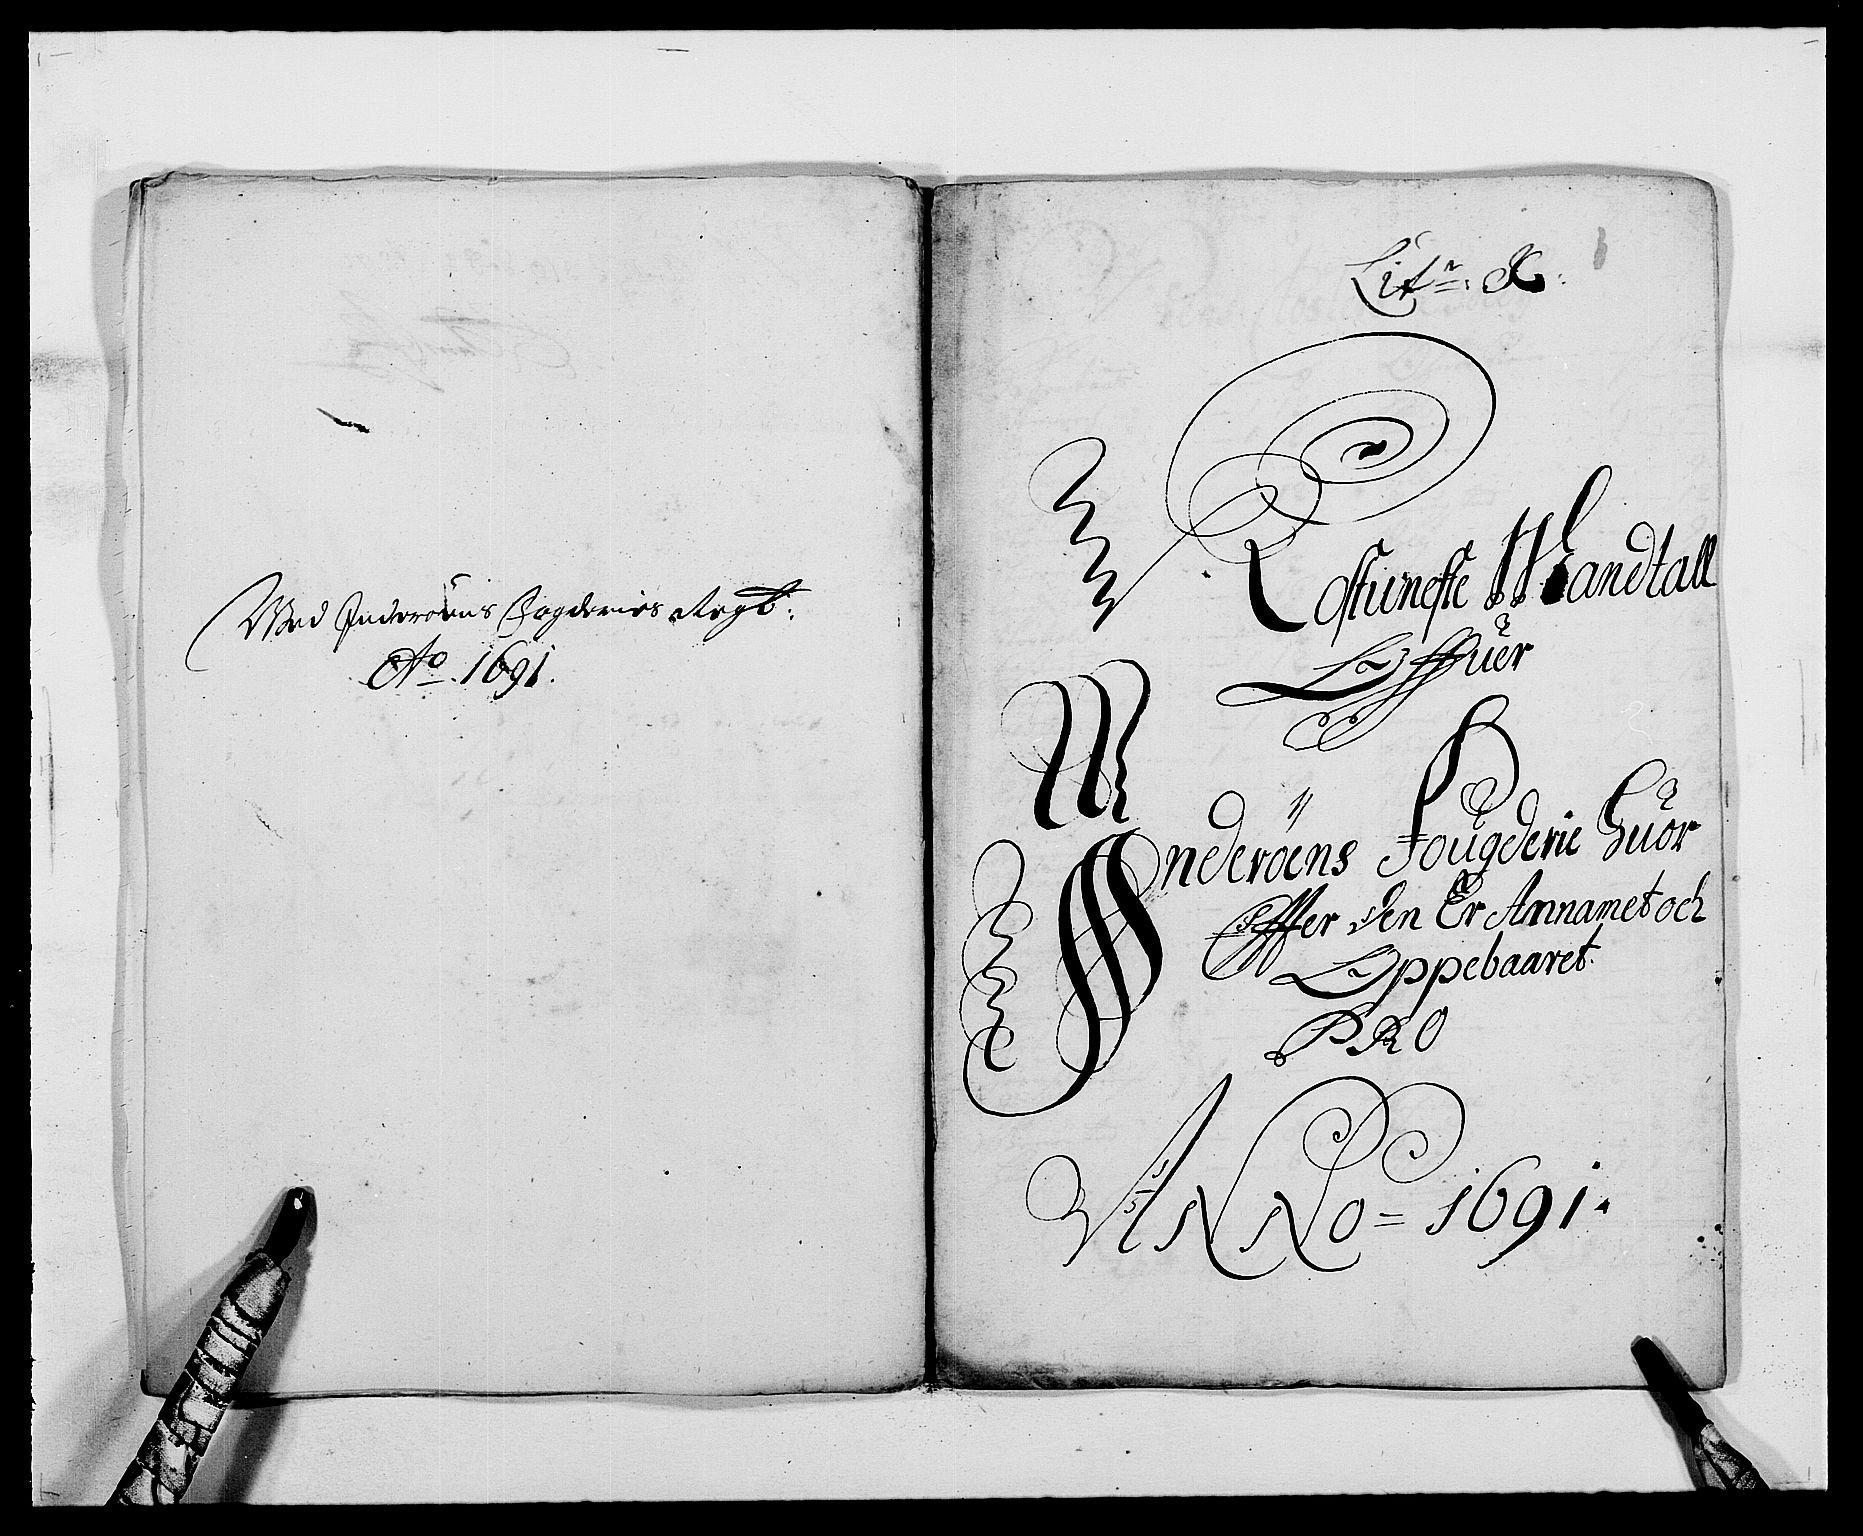 RA, Rentekammeret inntil 1814, Reviderte regnskaper, Fogderegnskap, R63/L4307: Fogderegnskap Inderøy, 1690-1691, s. 360